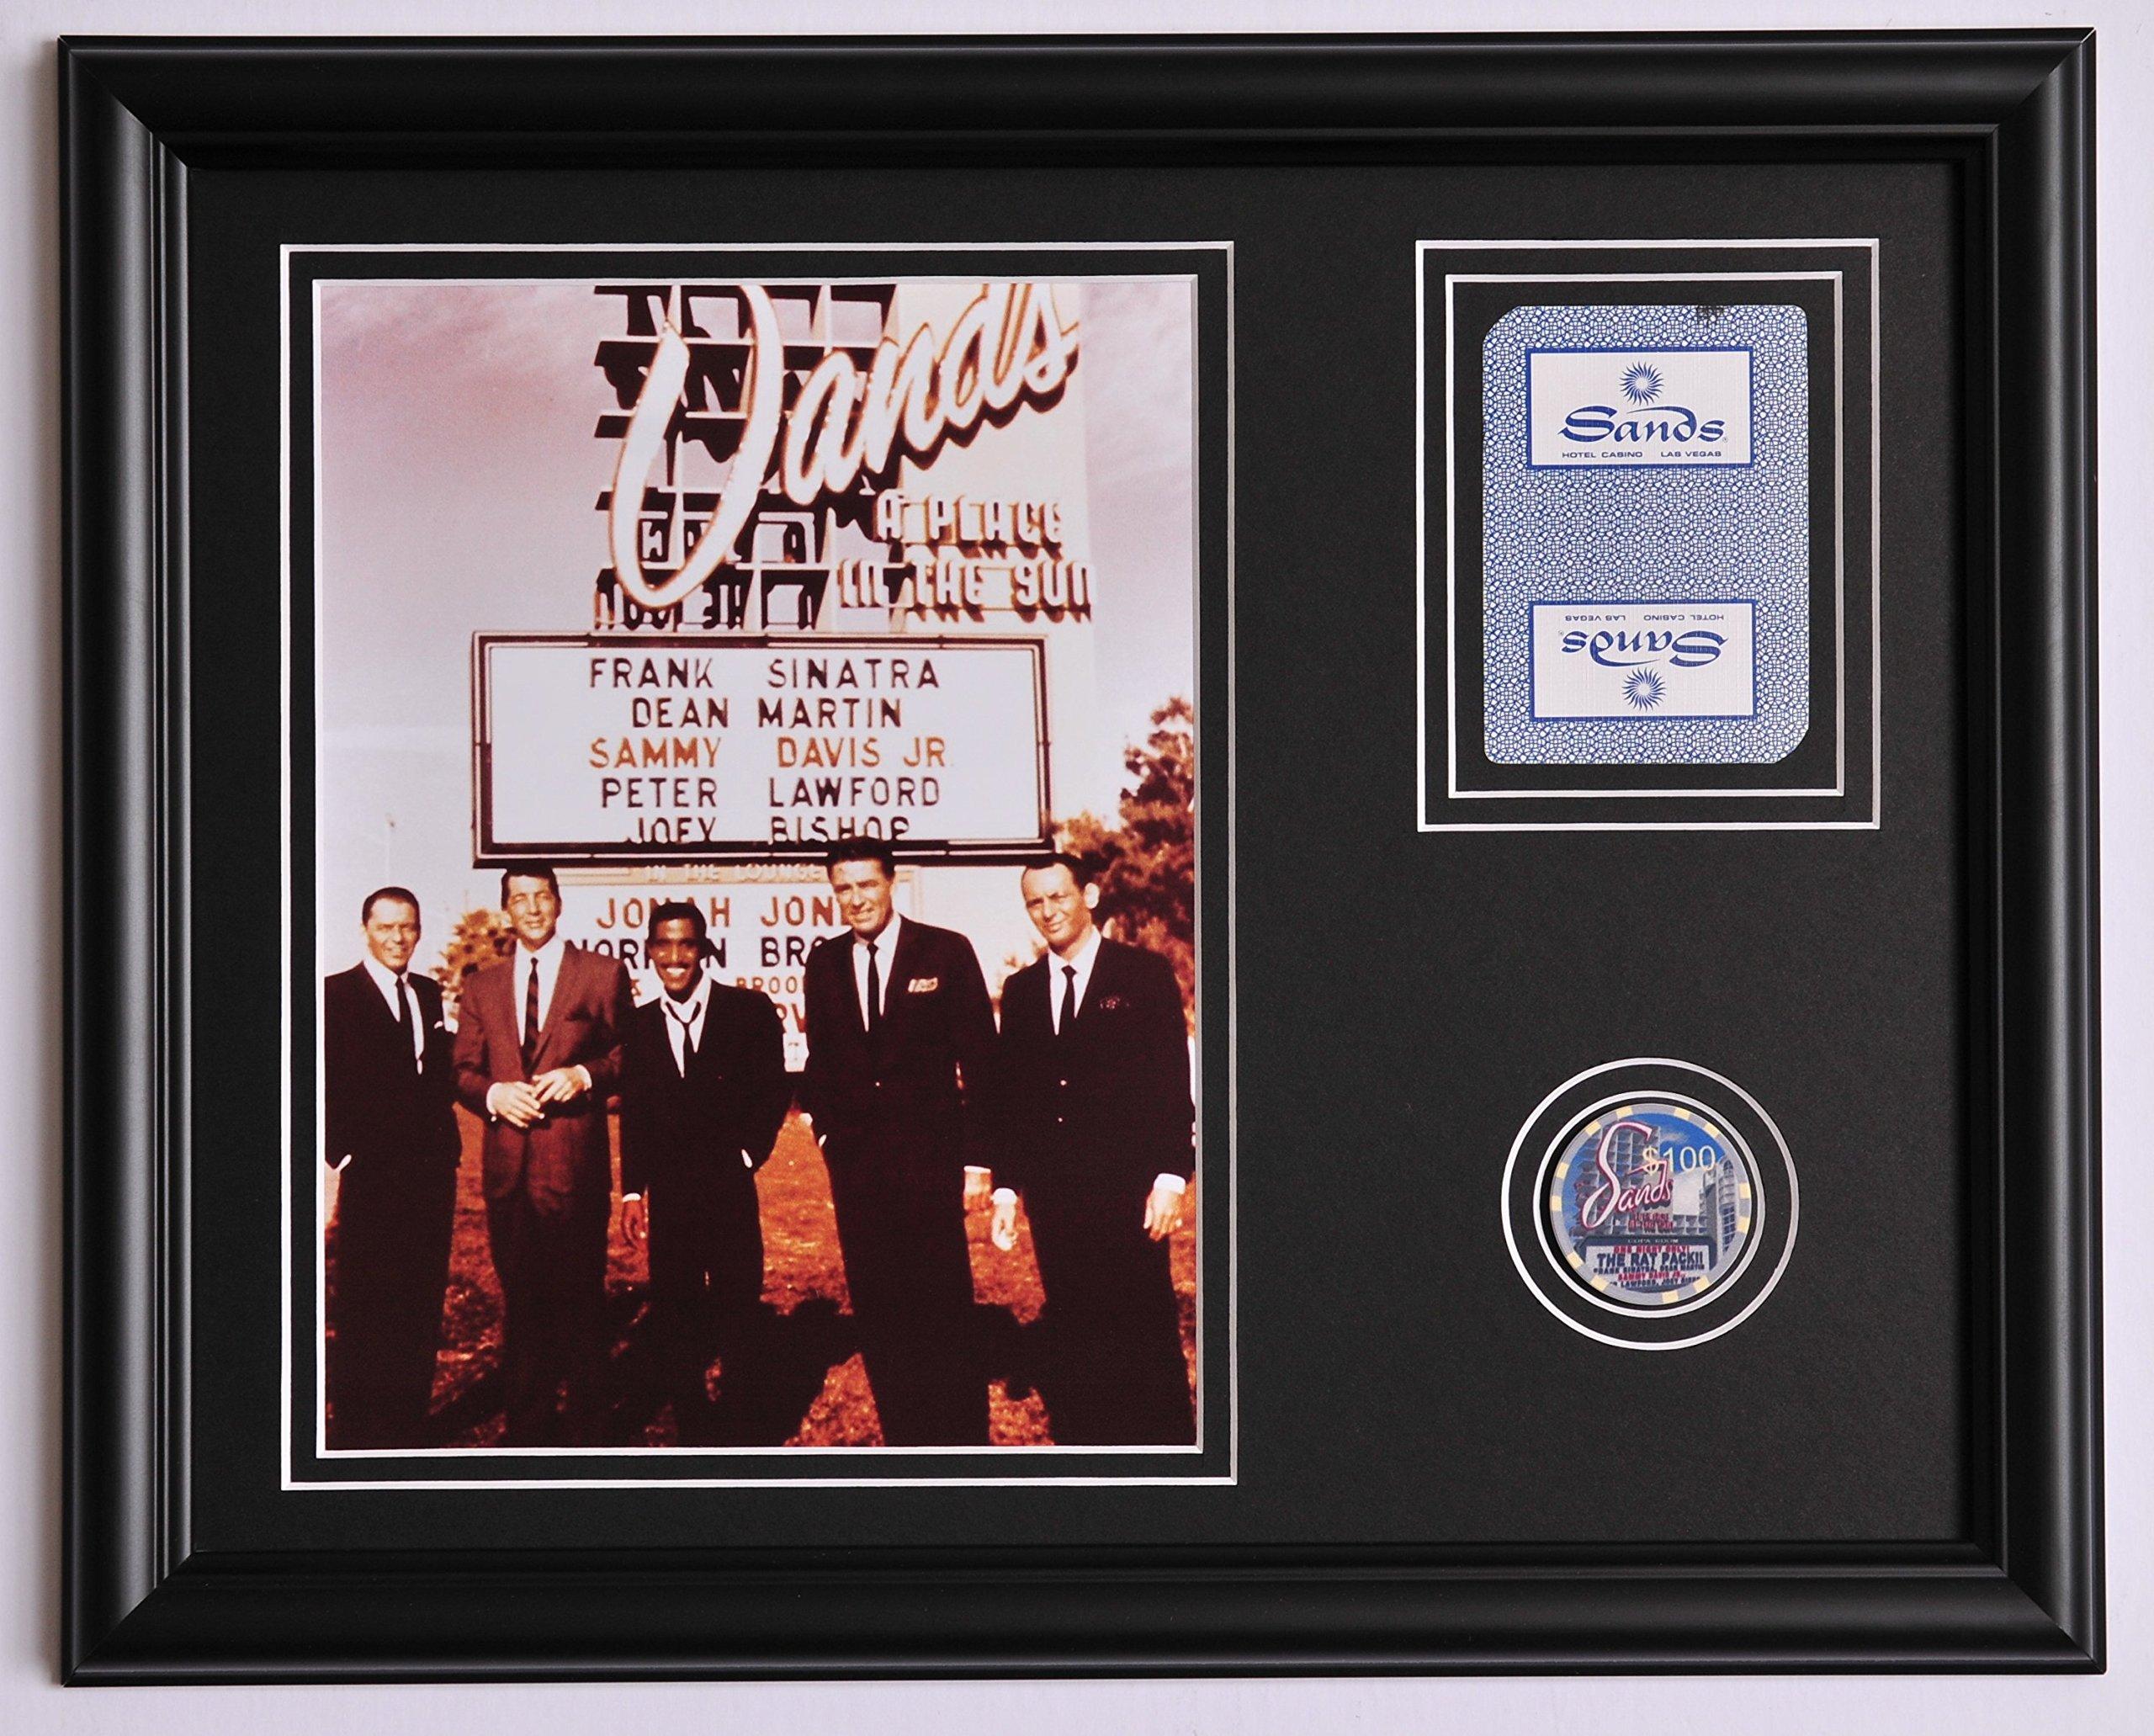 Buy The Rat Pack Sands Framed 8x10 Photo Poster Frank Sinatra Dean